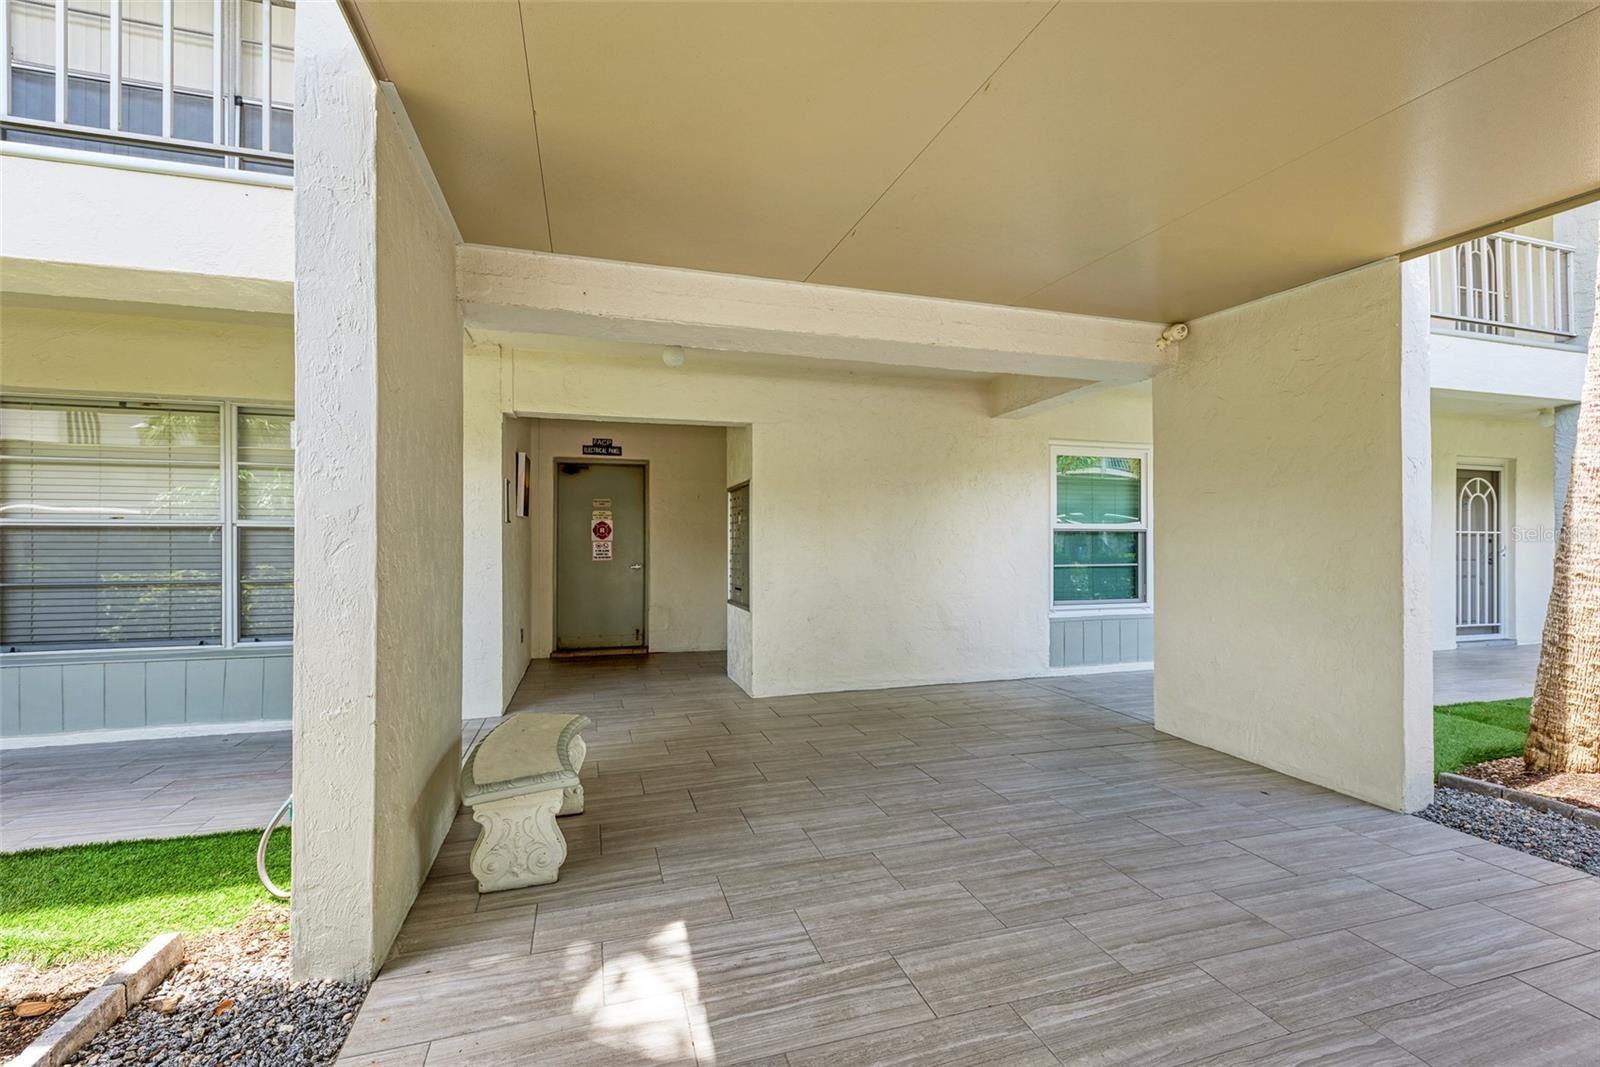 Photo of 4380 EXETER DR #303, LONGBOAT KEY, FL 34228 (MLS # A4507230)